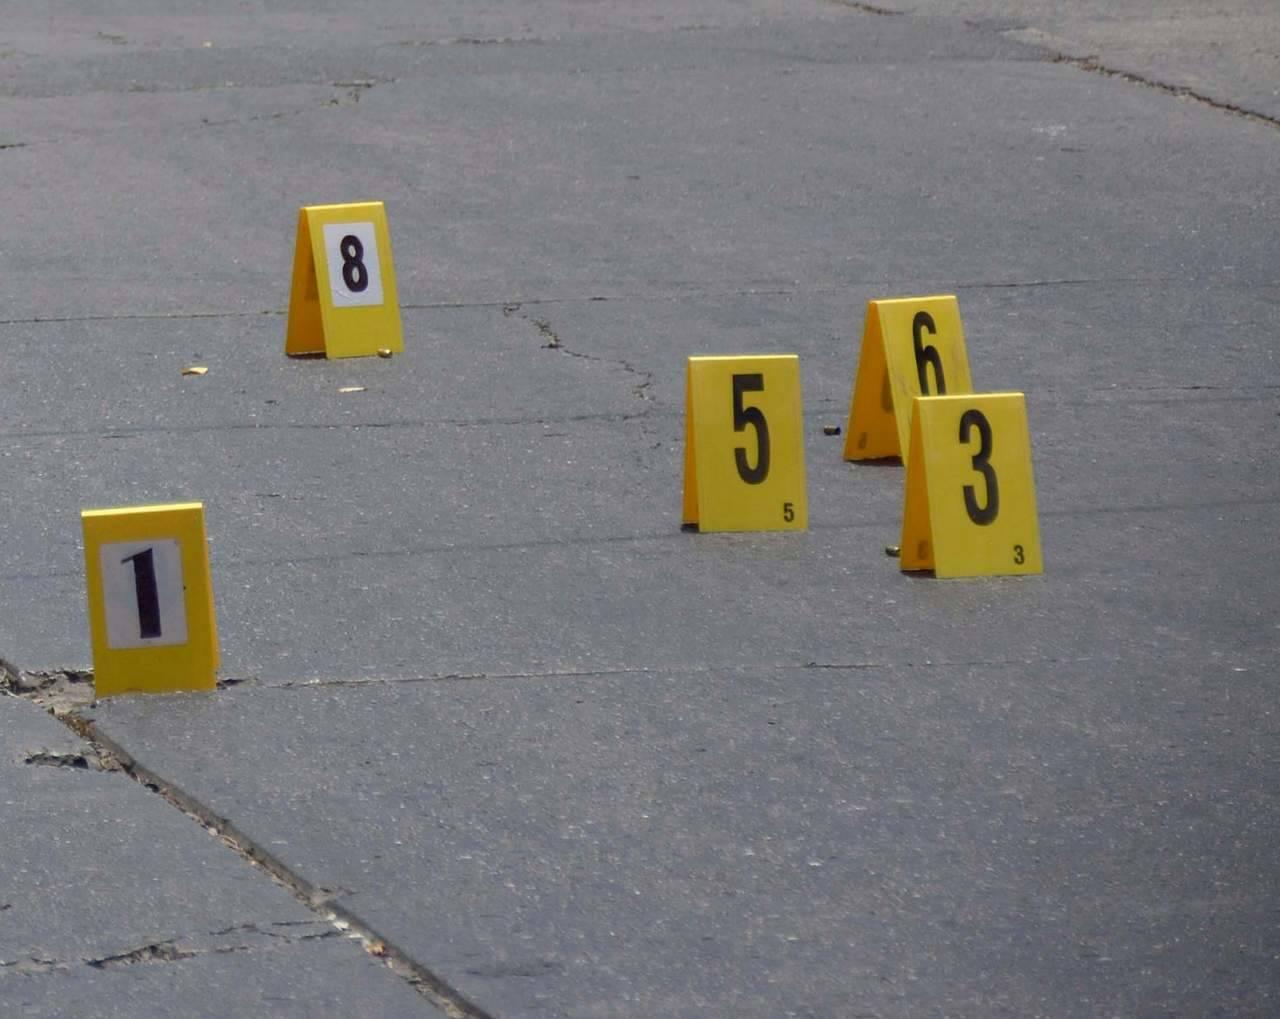 Asesinan a 21 personas en Guanajuato en 30 horas